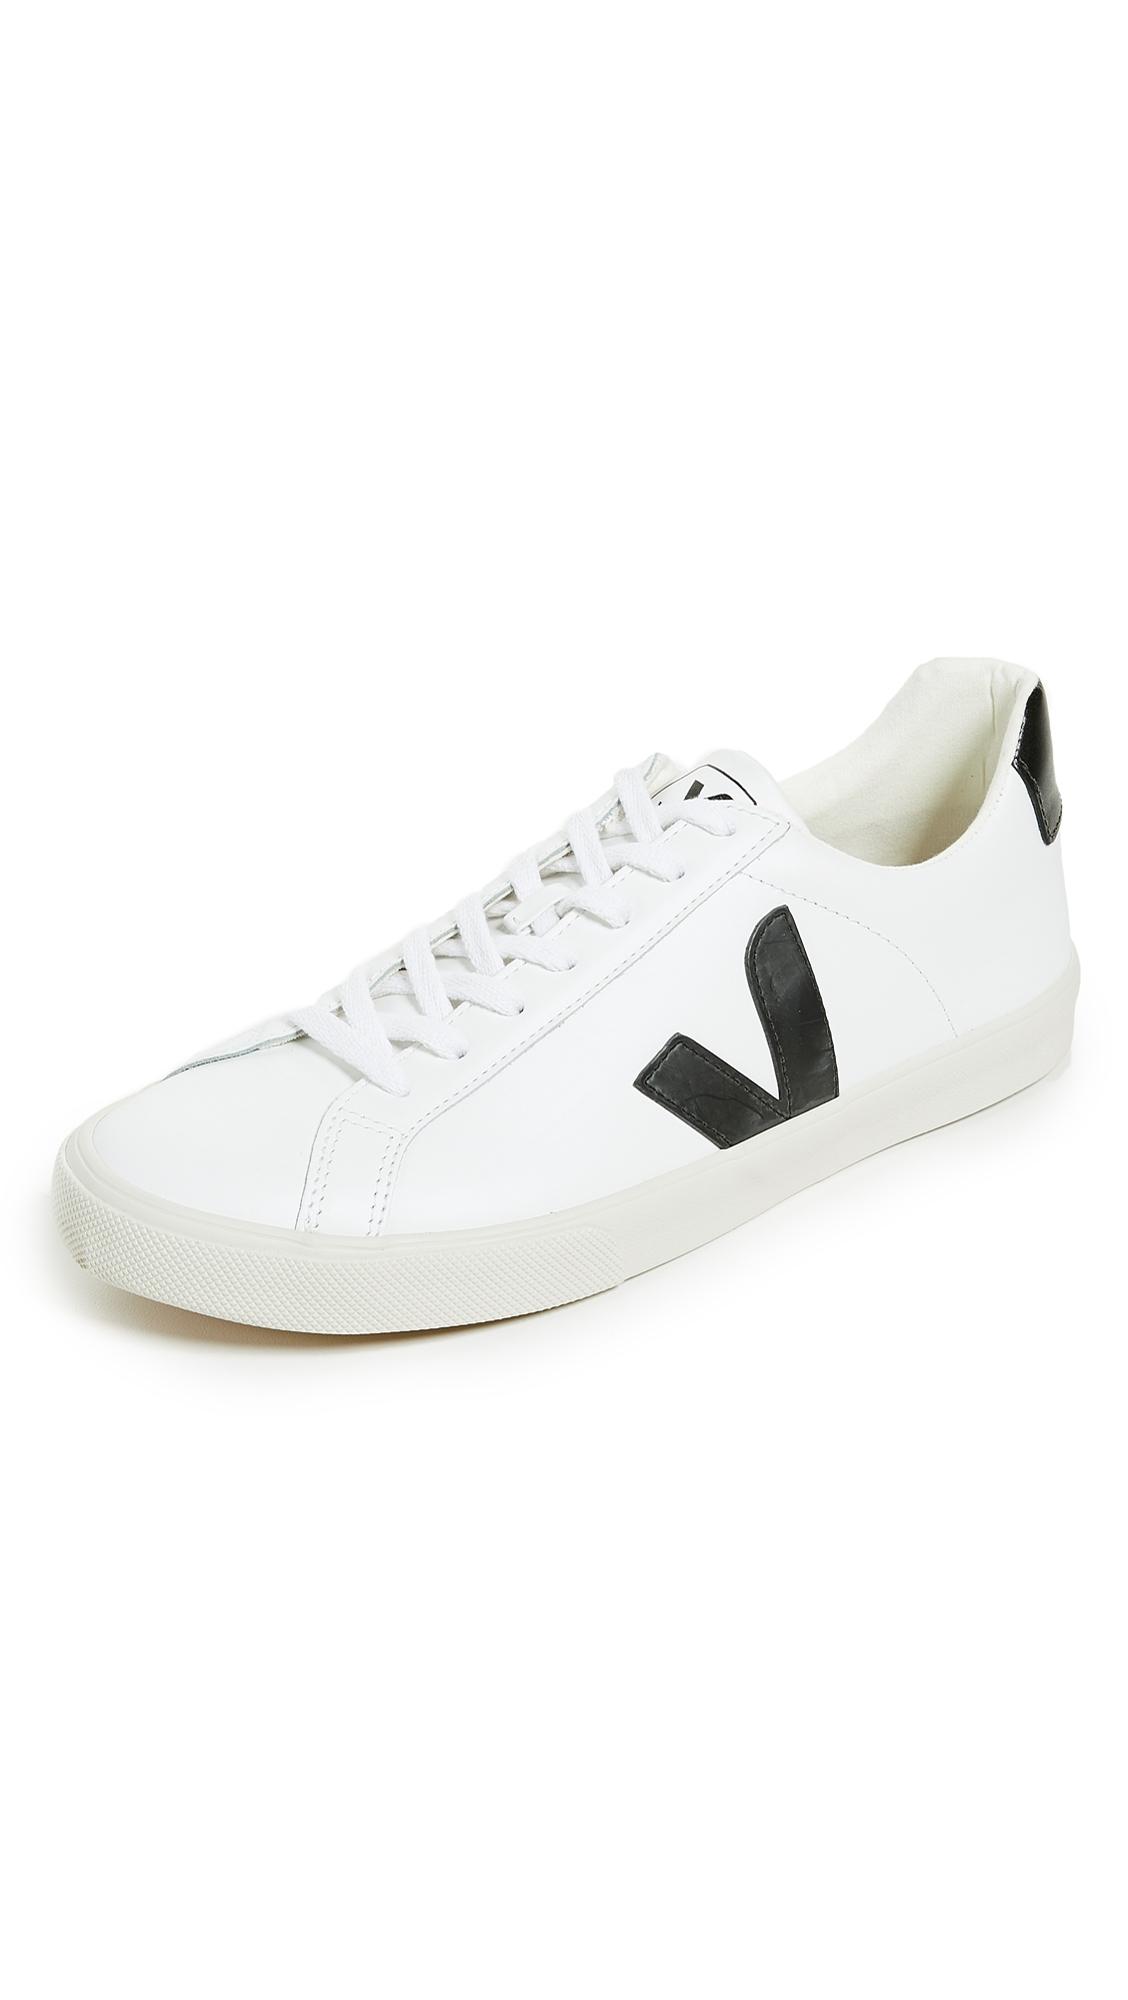 VEJA Esplar Rubber-Trimmed Leather Sneakers - White